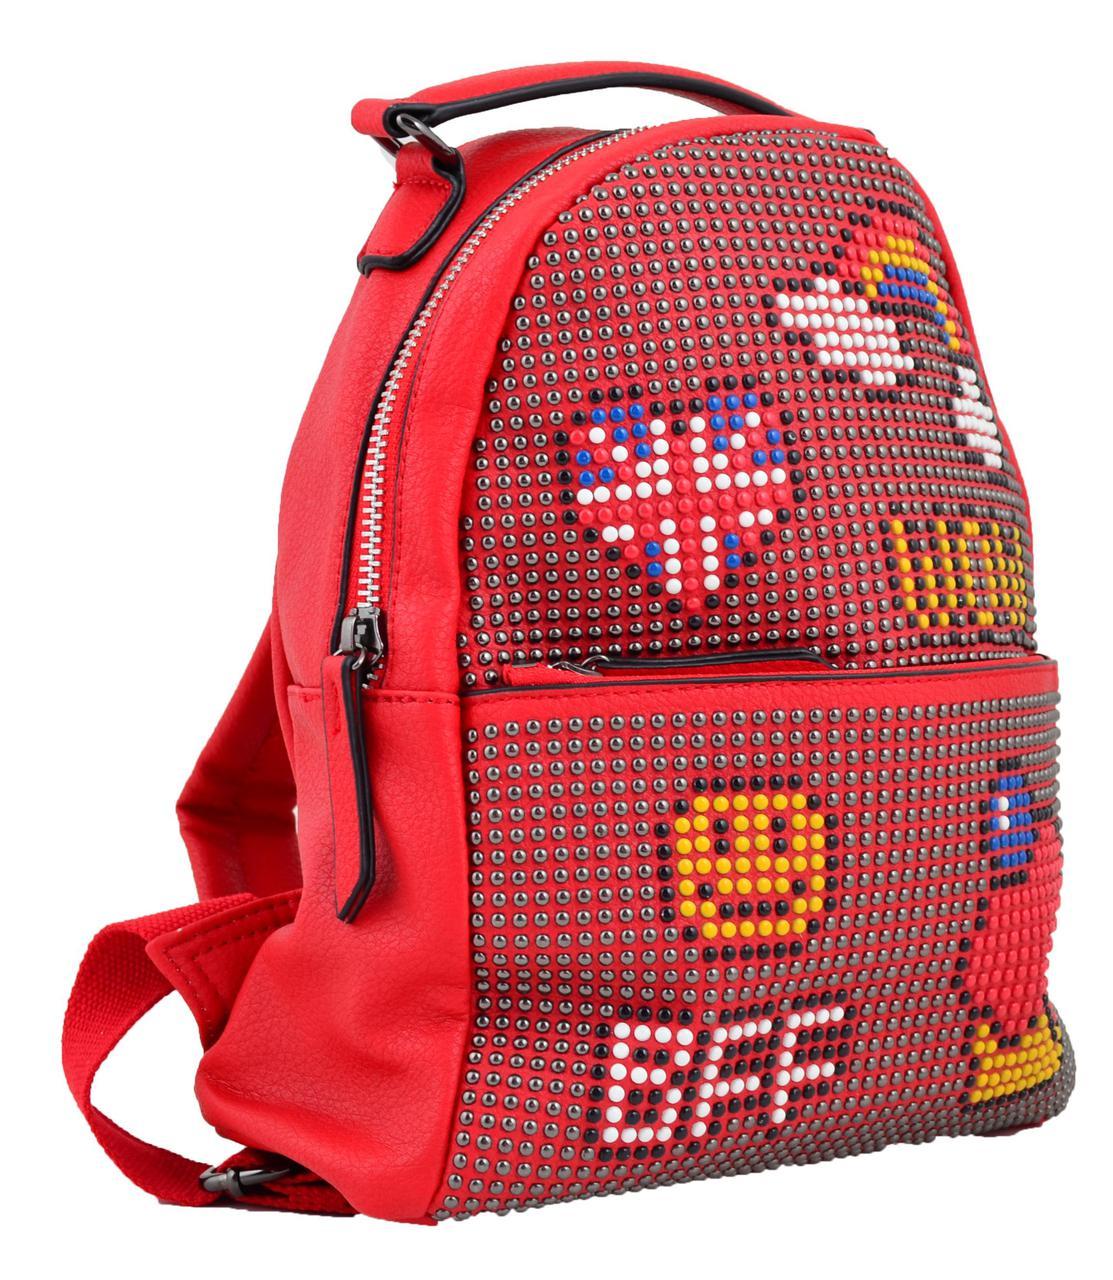 8588ec2bedd Сумка-рюкзак YES Weekend , 555174, 10 л, цвет красный — только ...